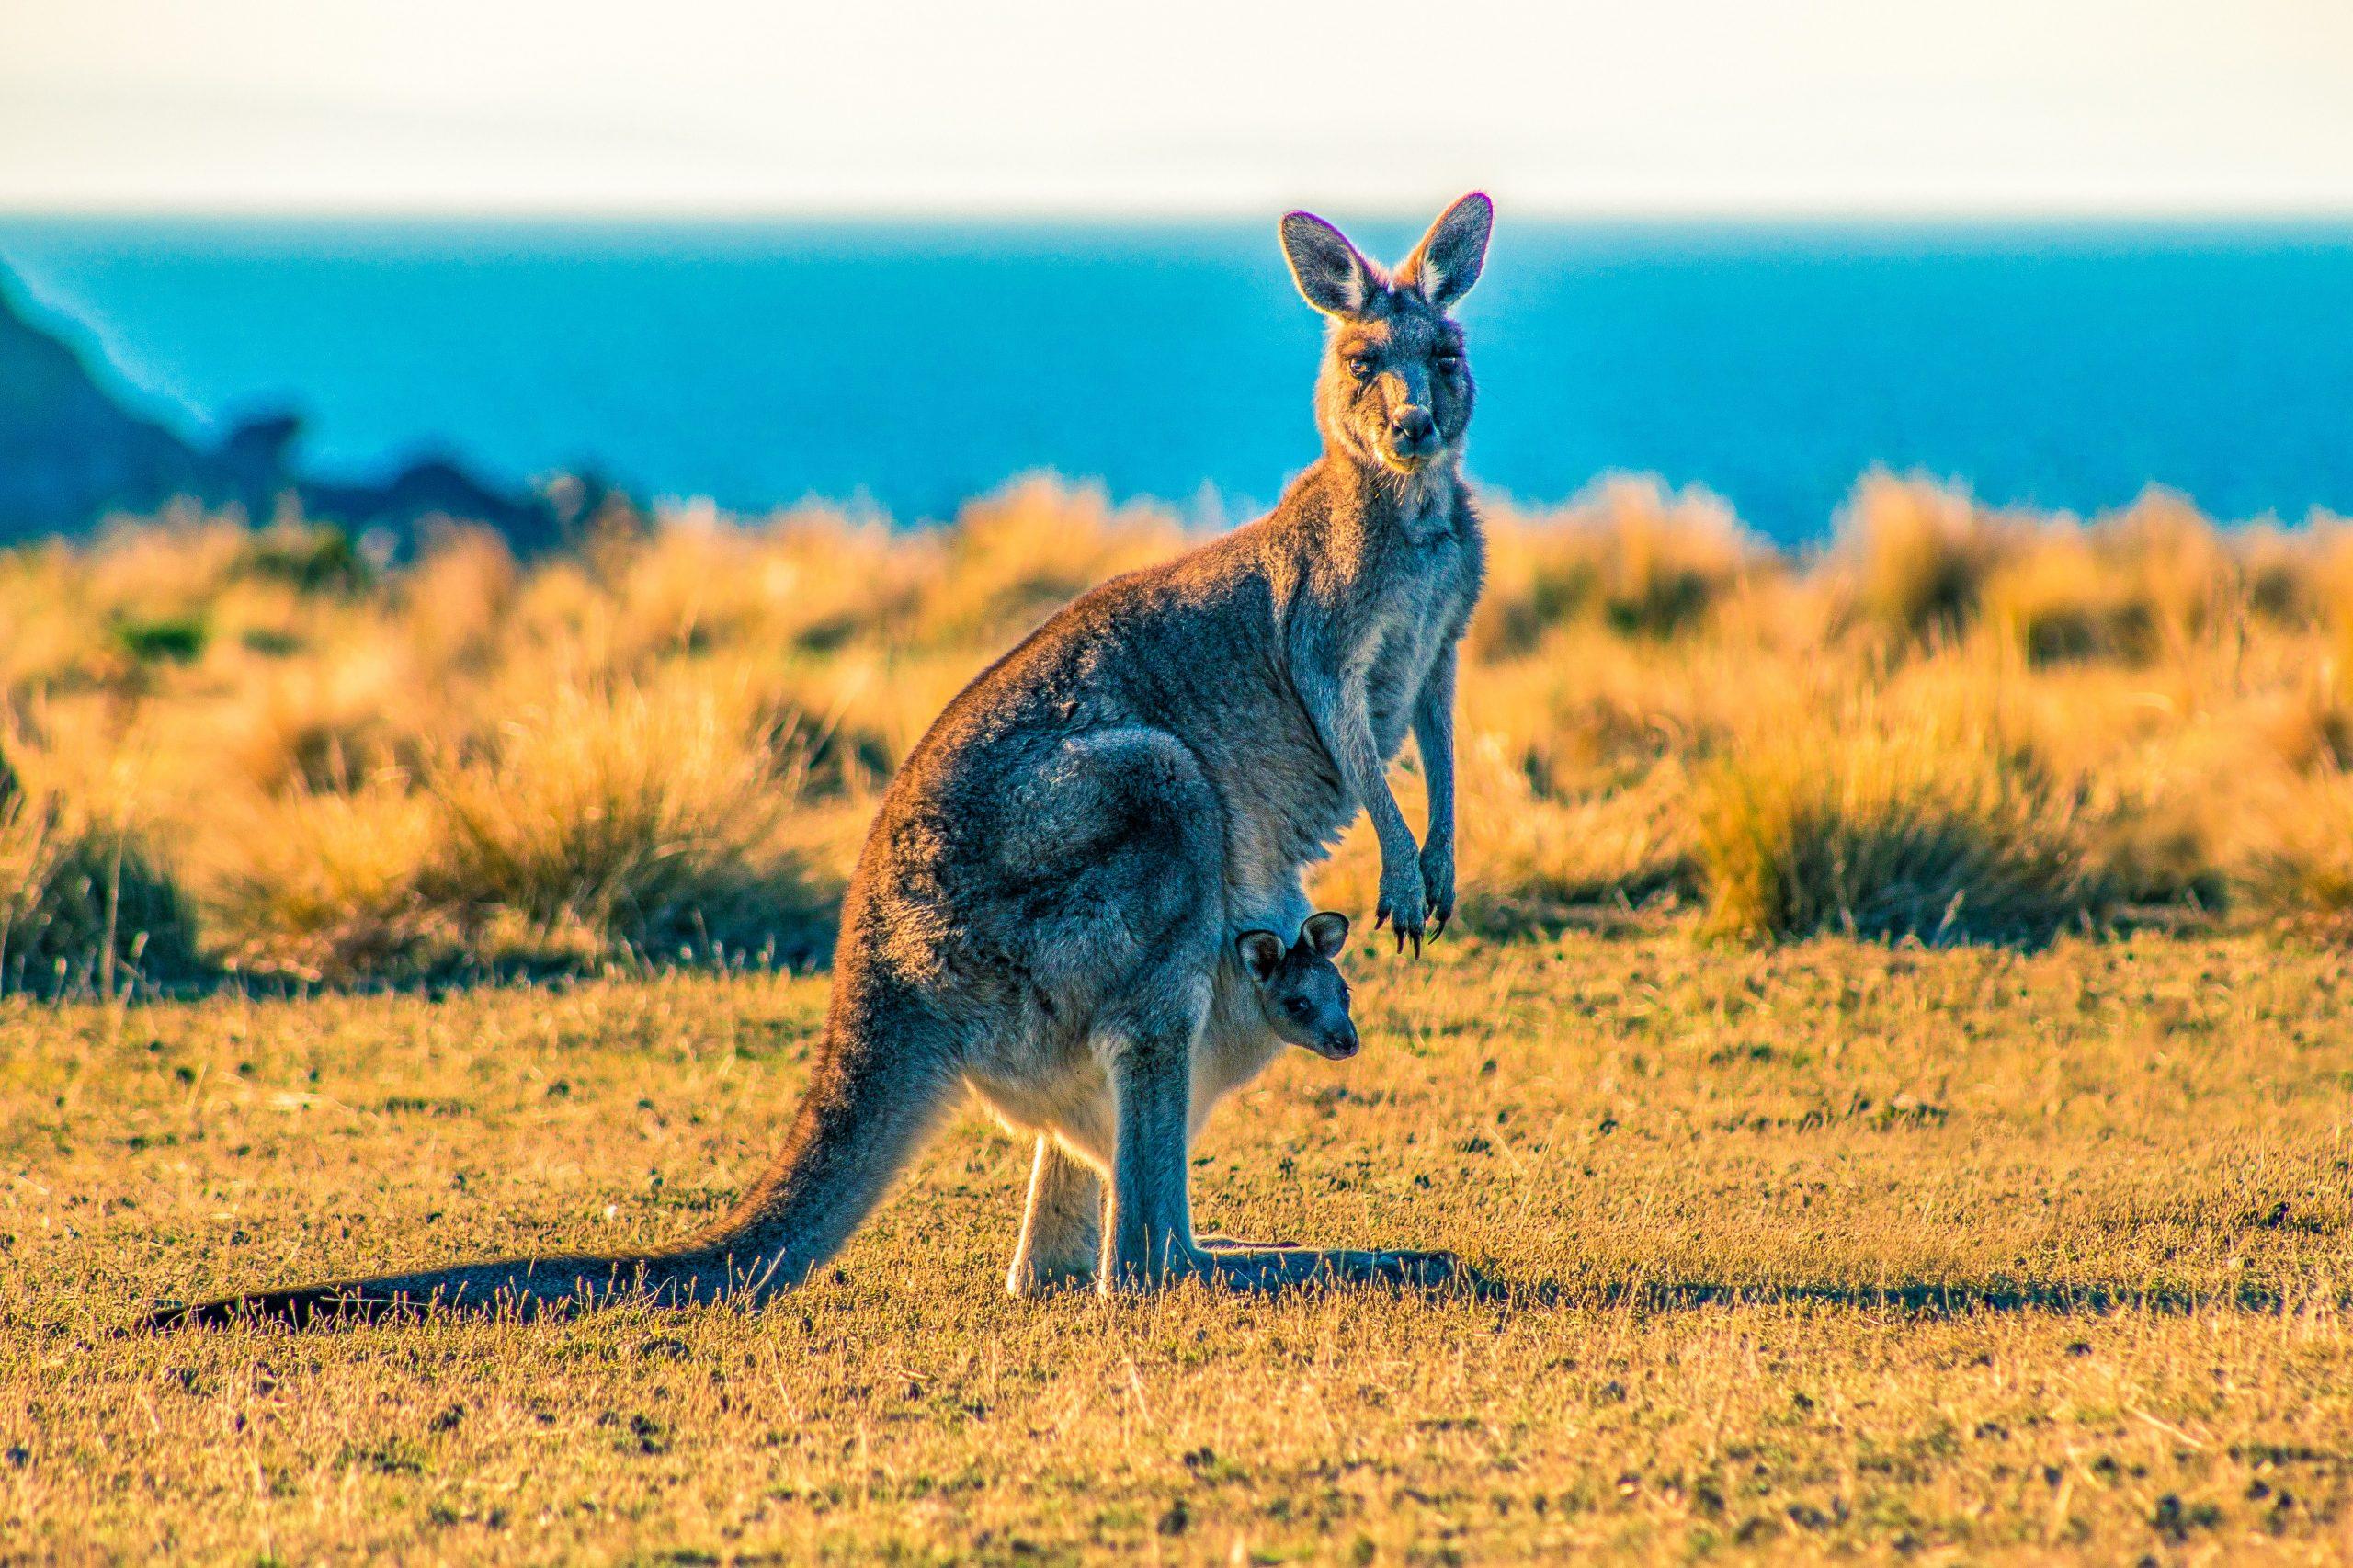 Am I an Australian resident for tax purposes?